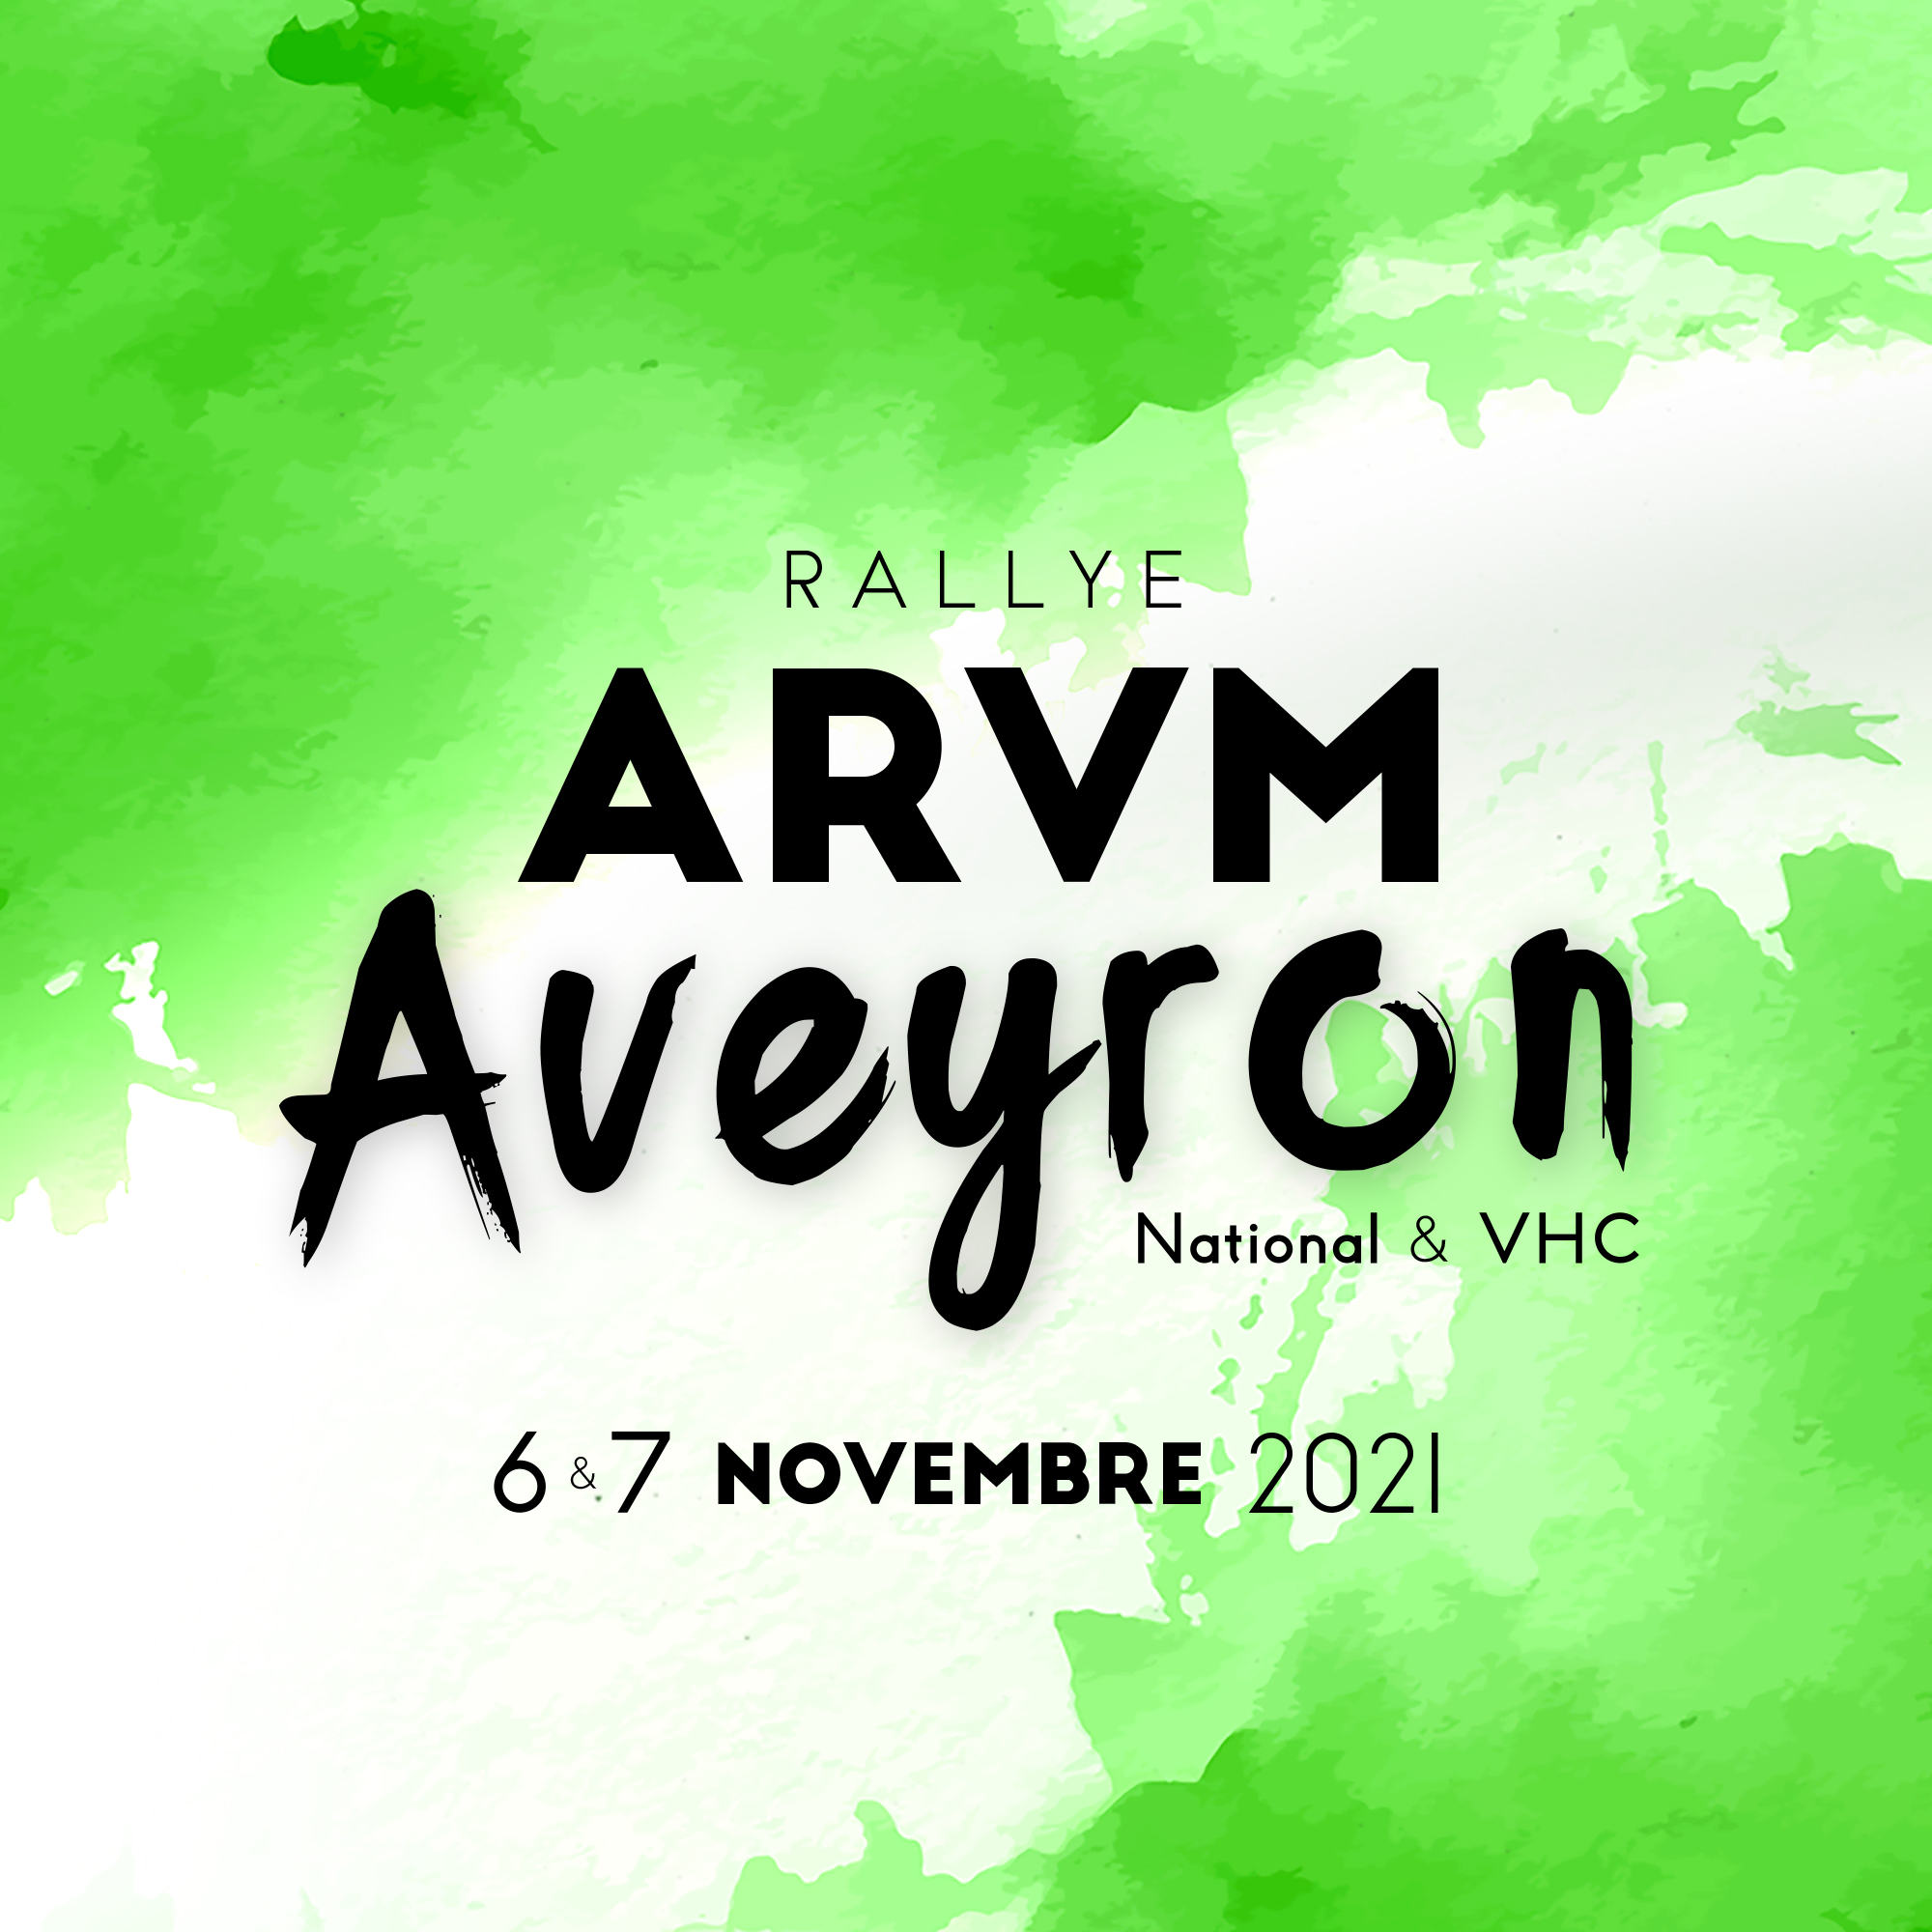 Rallye ARVM-AVEYRON 2021 – engagements ouverts – clôture le 25/10/21